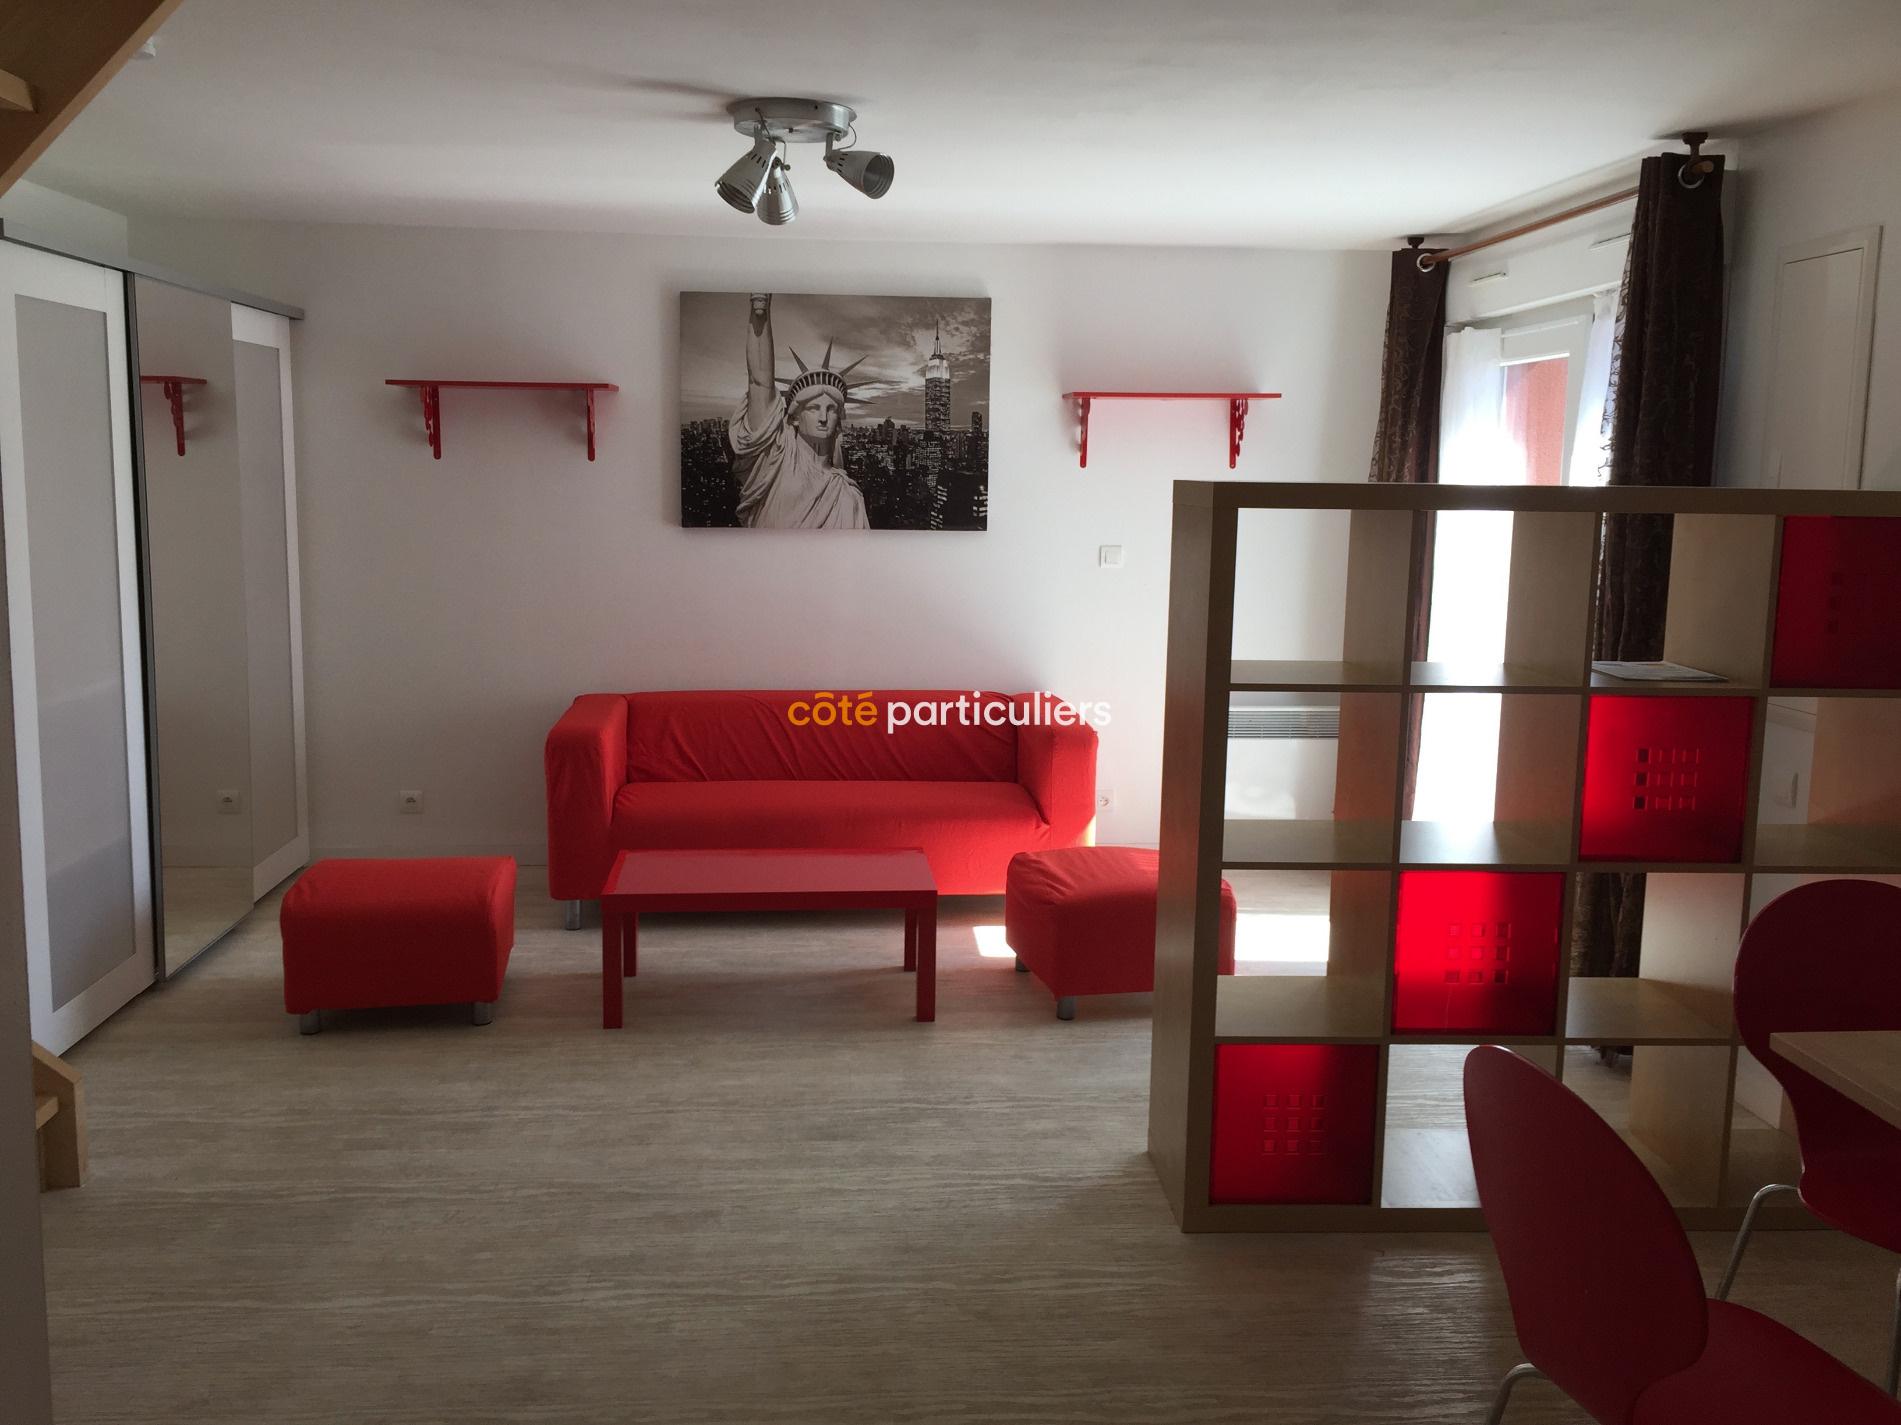 Vente special investisseur t2 duplex renove et meuble proche iut